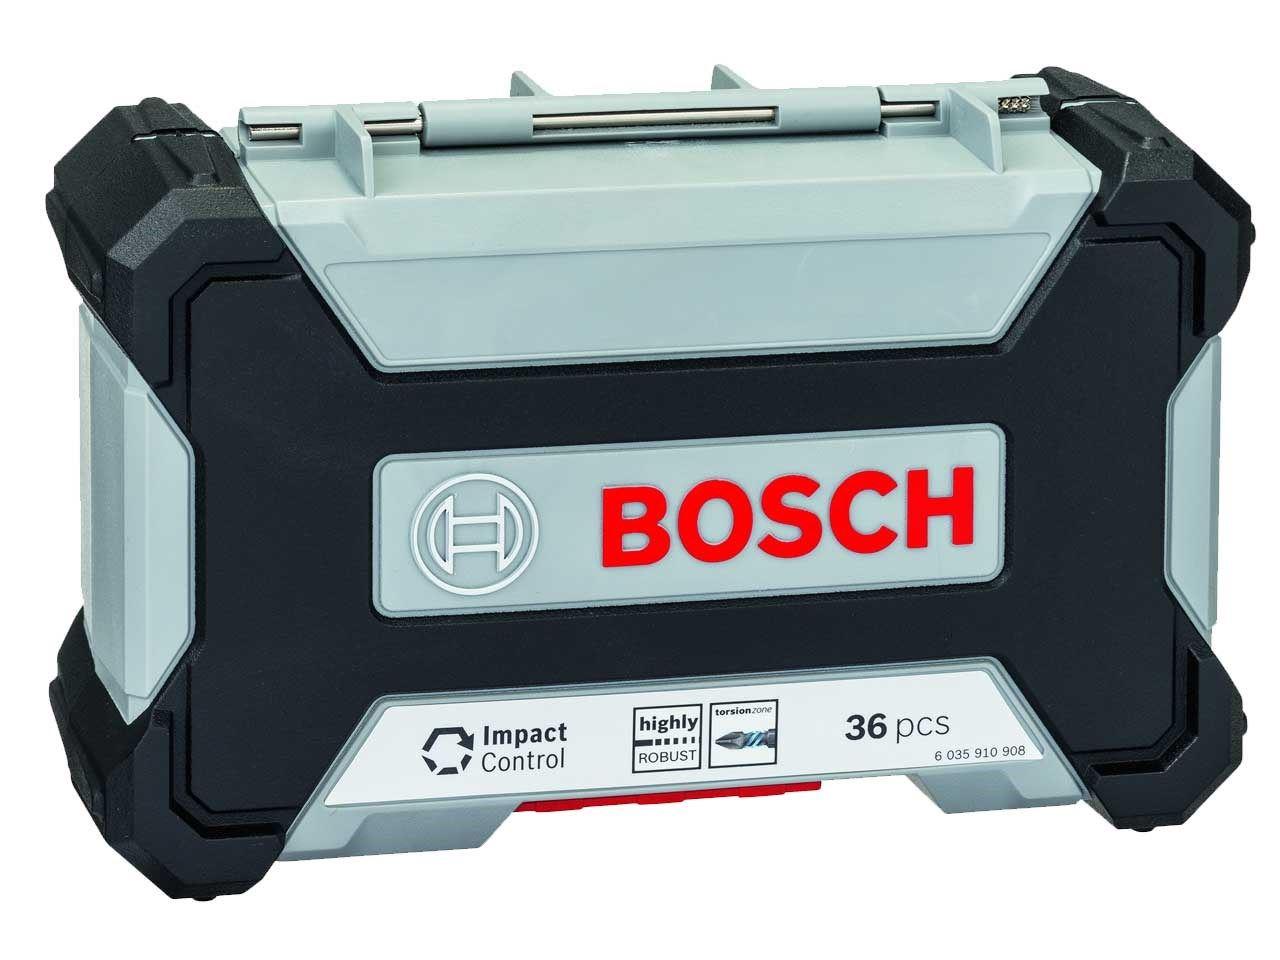 Set bitova i nasadnih ključeva Bosch 2607017597 Impact Control, 36 delova + stolica na naduvavanje (2607017597)